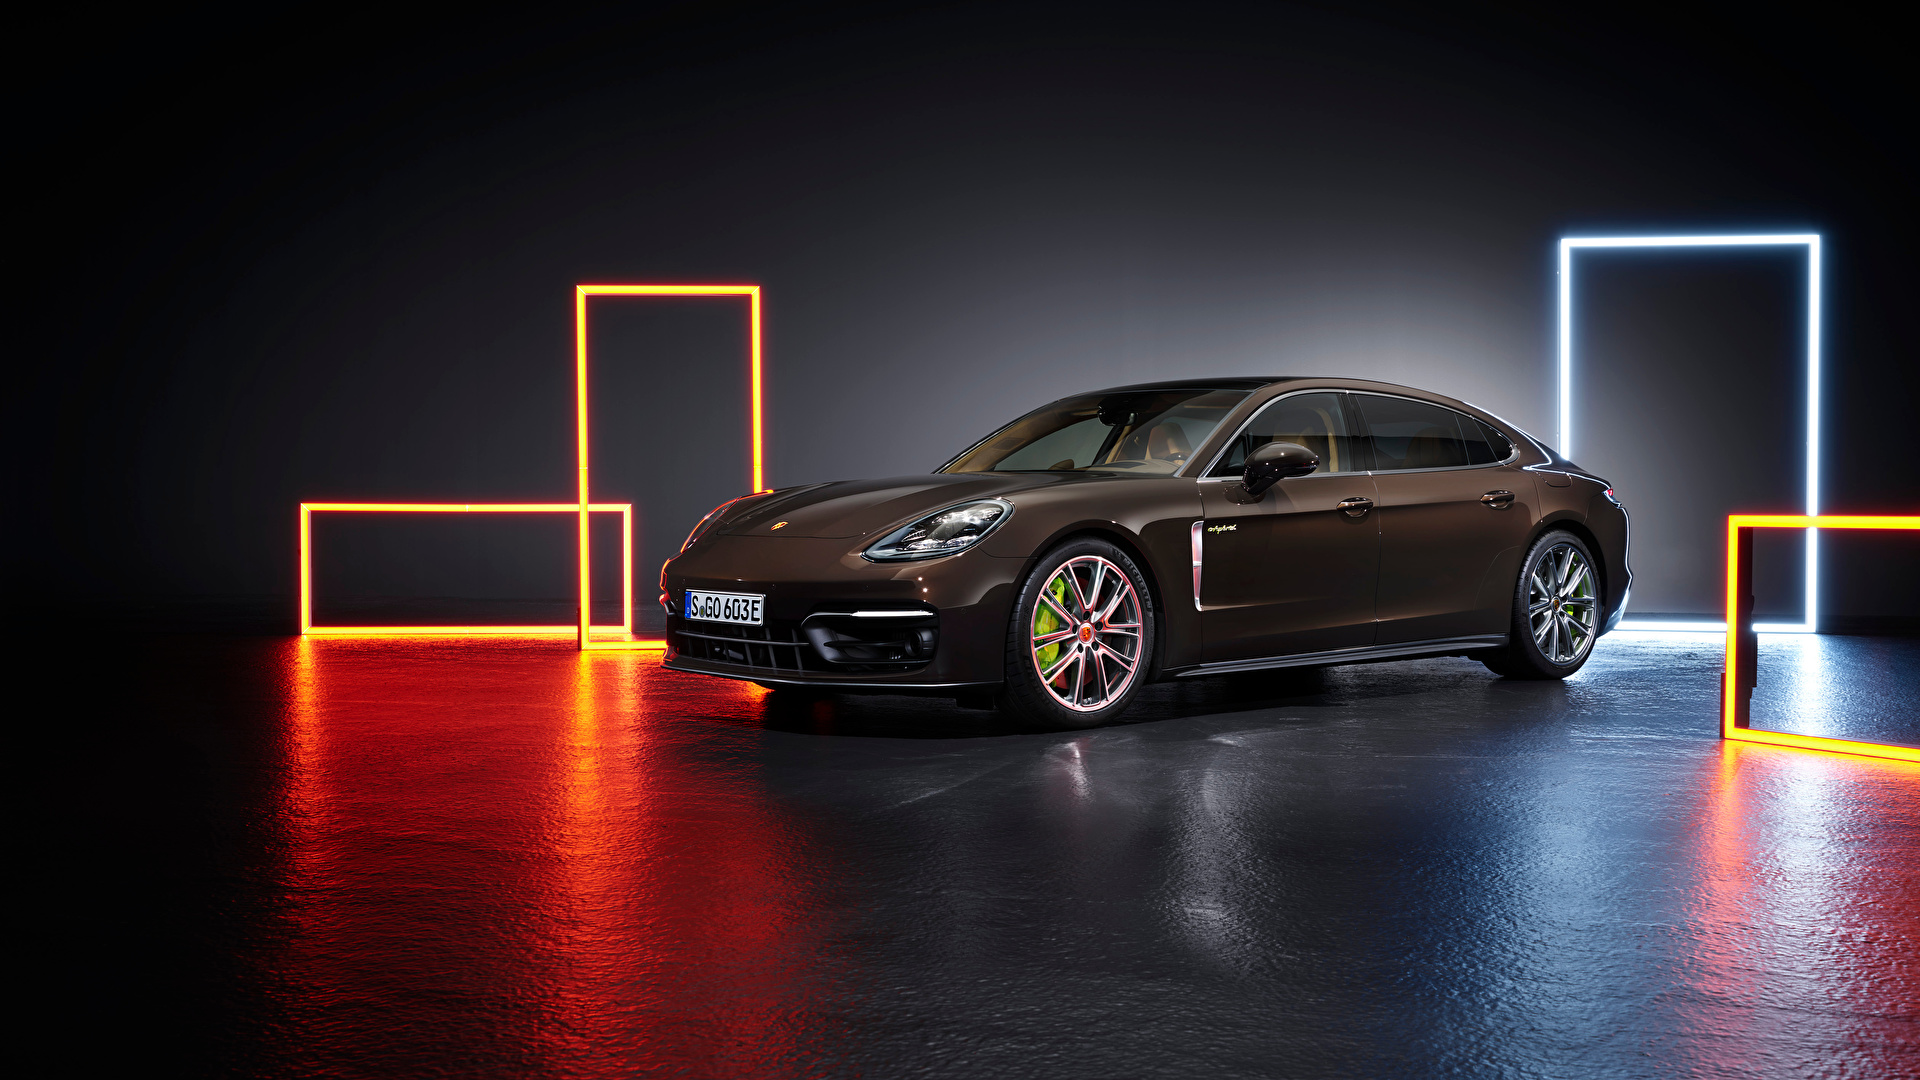 Фото Порше anamera 4S E-Hybrid Executive, (971), 2020 коричневые Сбоку Металлик Автомобили 1920x1080 Porsche Коричневый коричневая авто машины машина автомобиль